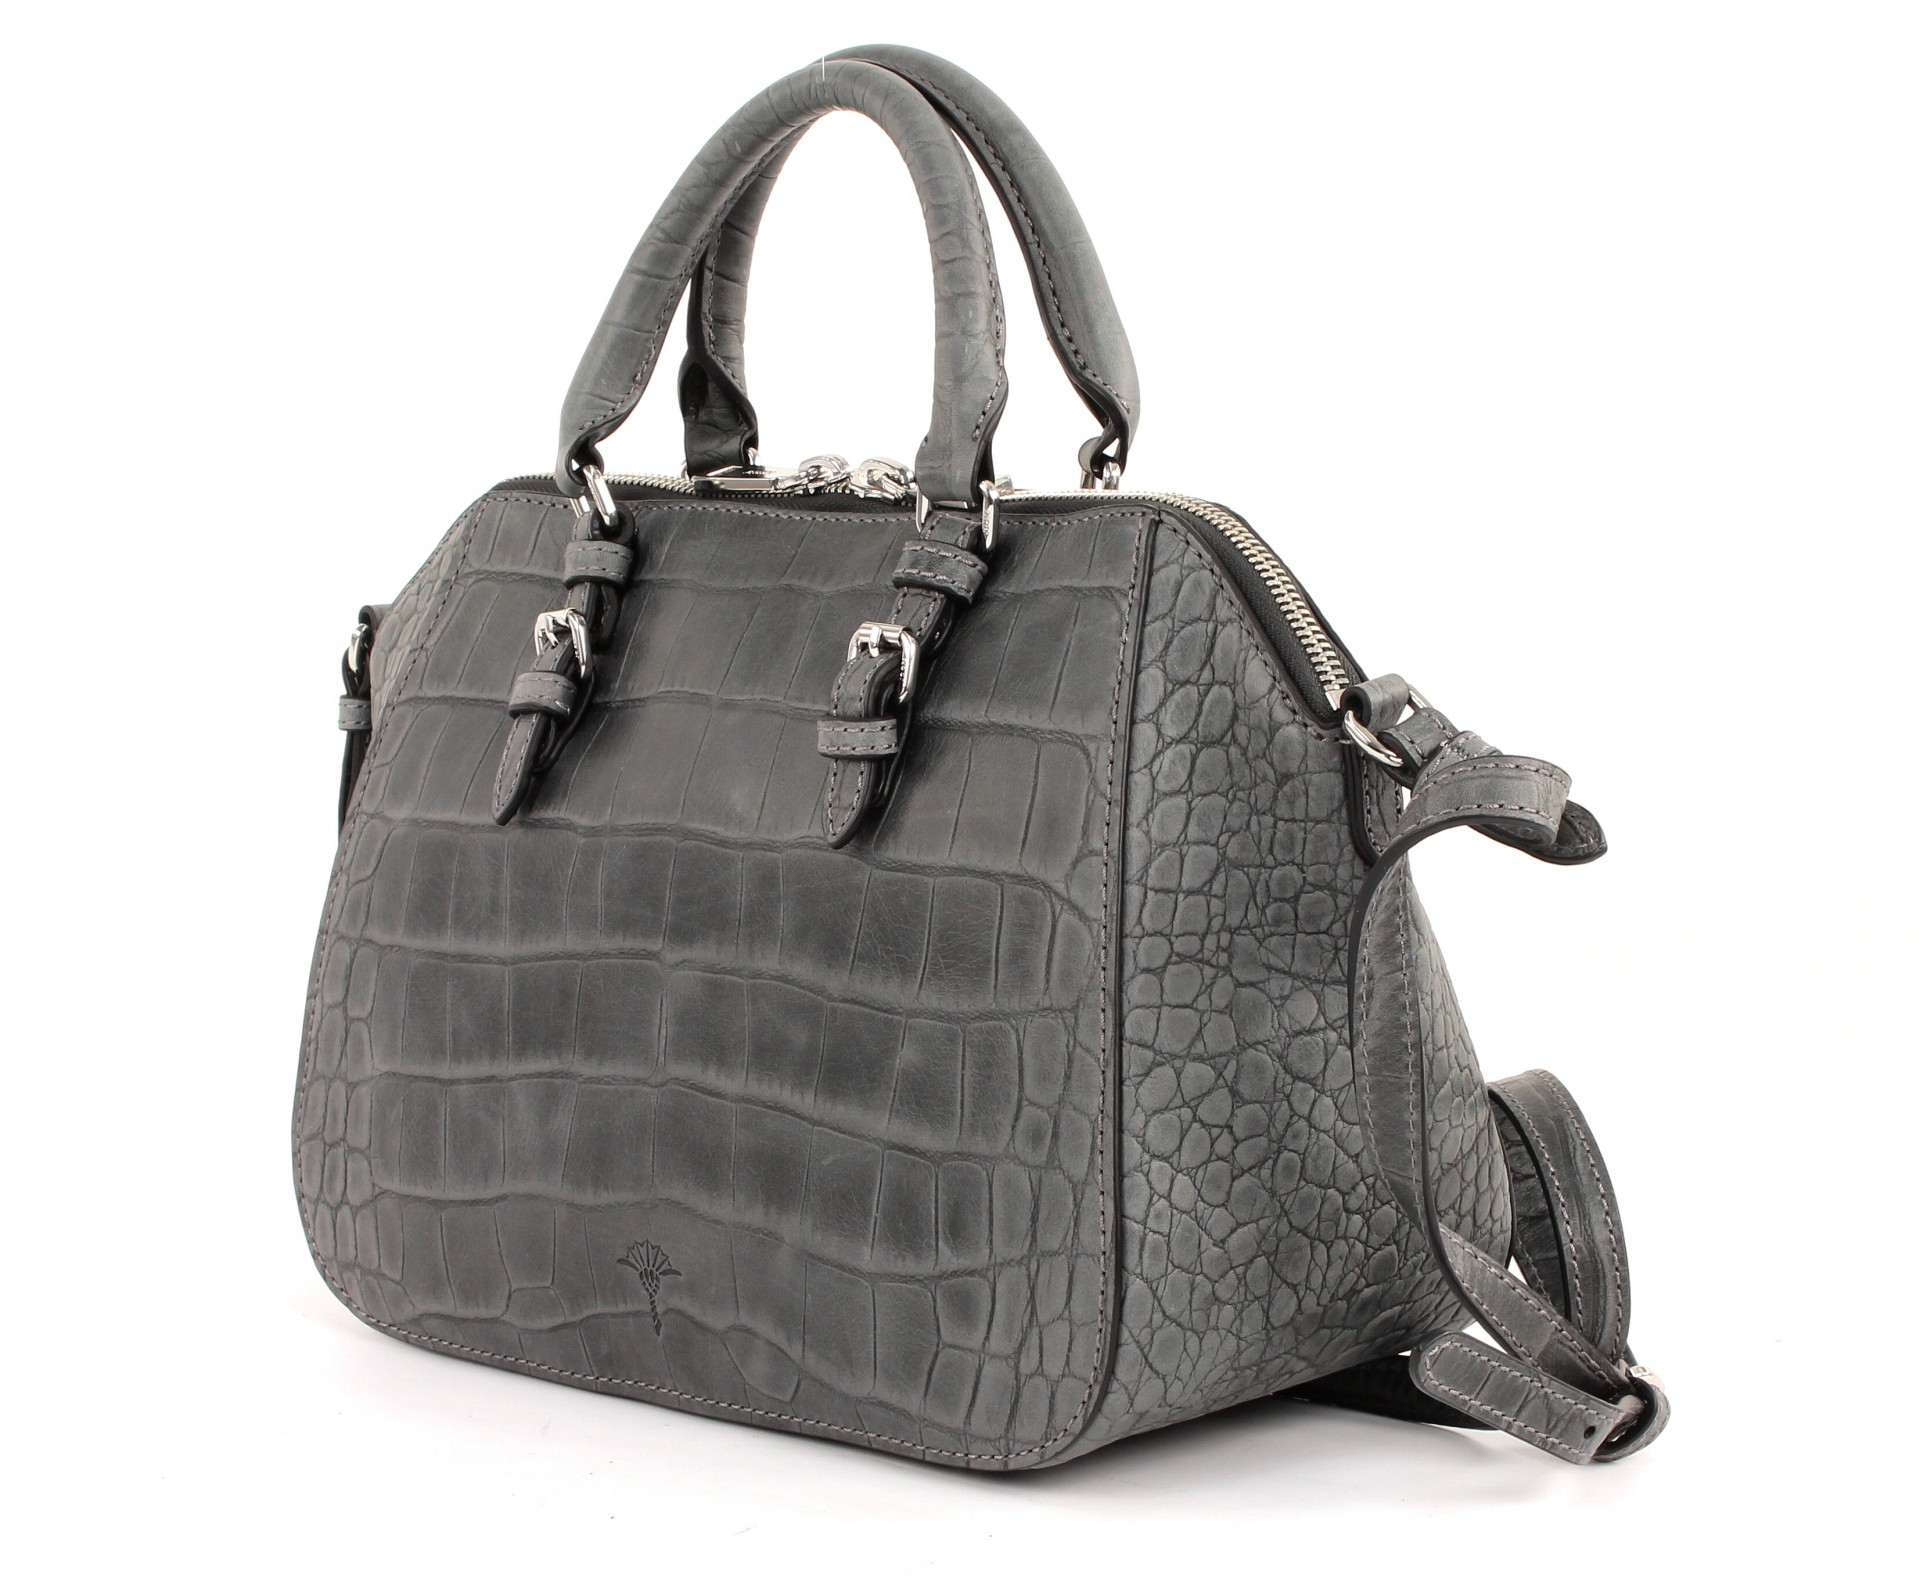 joop thoosa croco soft handbag medium tasche handtasche umh ngetasche damen ebay. Black Bedroom Furniture Sets. Home Design Ideas